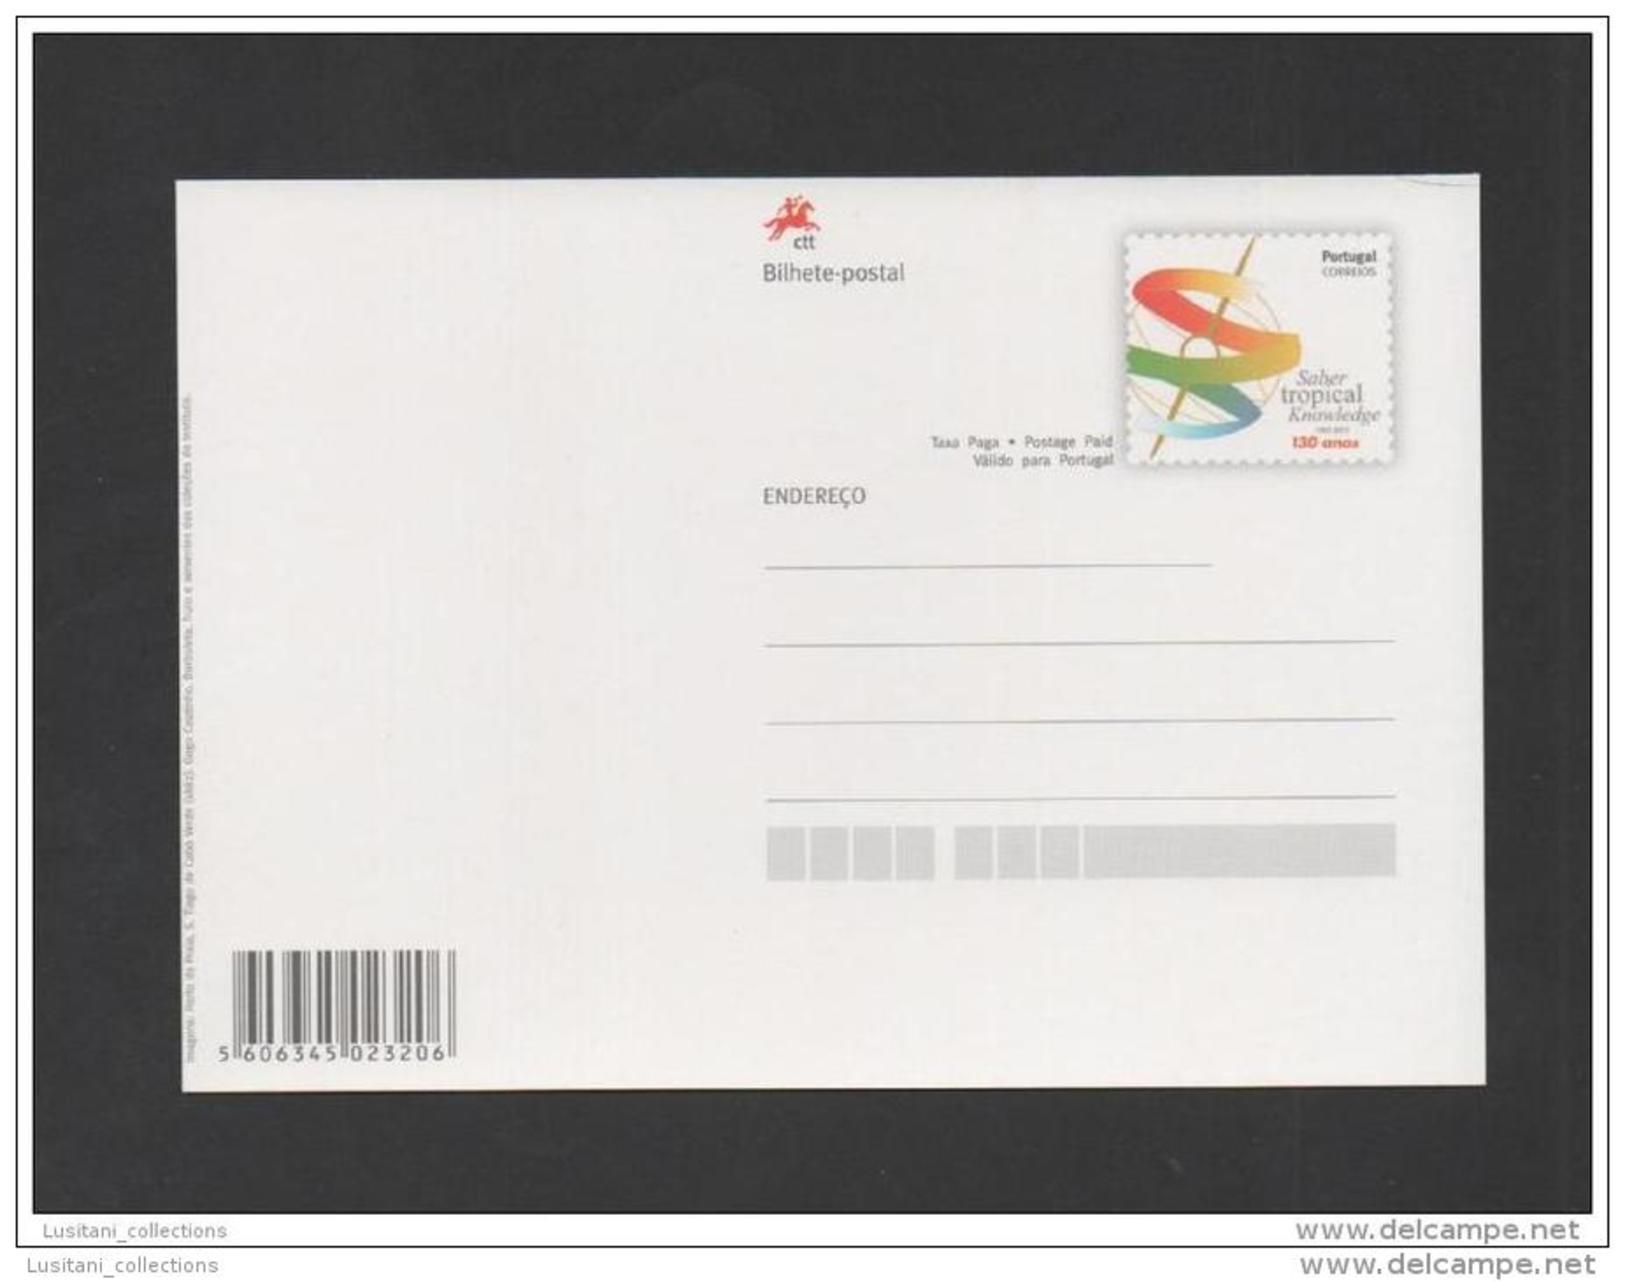 Postal Stationery PORTUGAL SCIENTIFIC TROPICAL INVESTIGATION INSTITUTE AFRICA CAP VERT CABO VERDE - Cap Vert